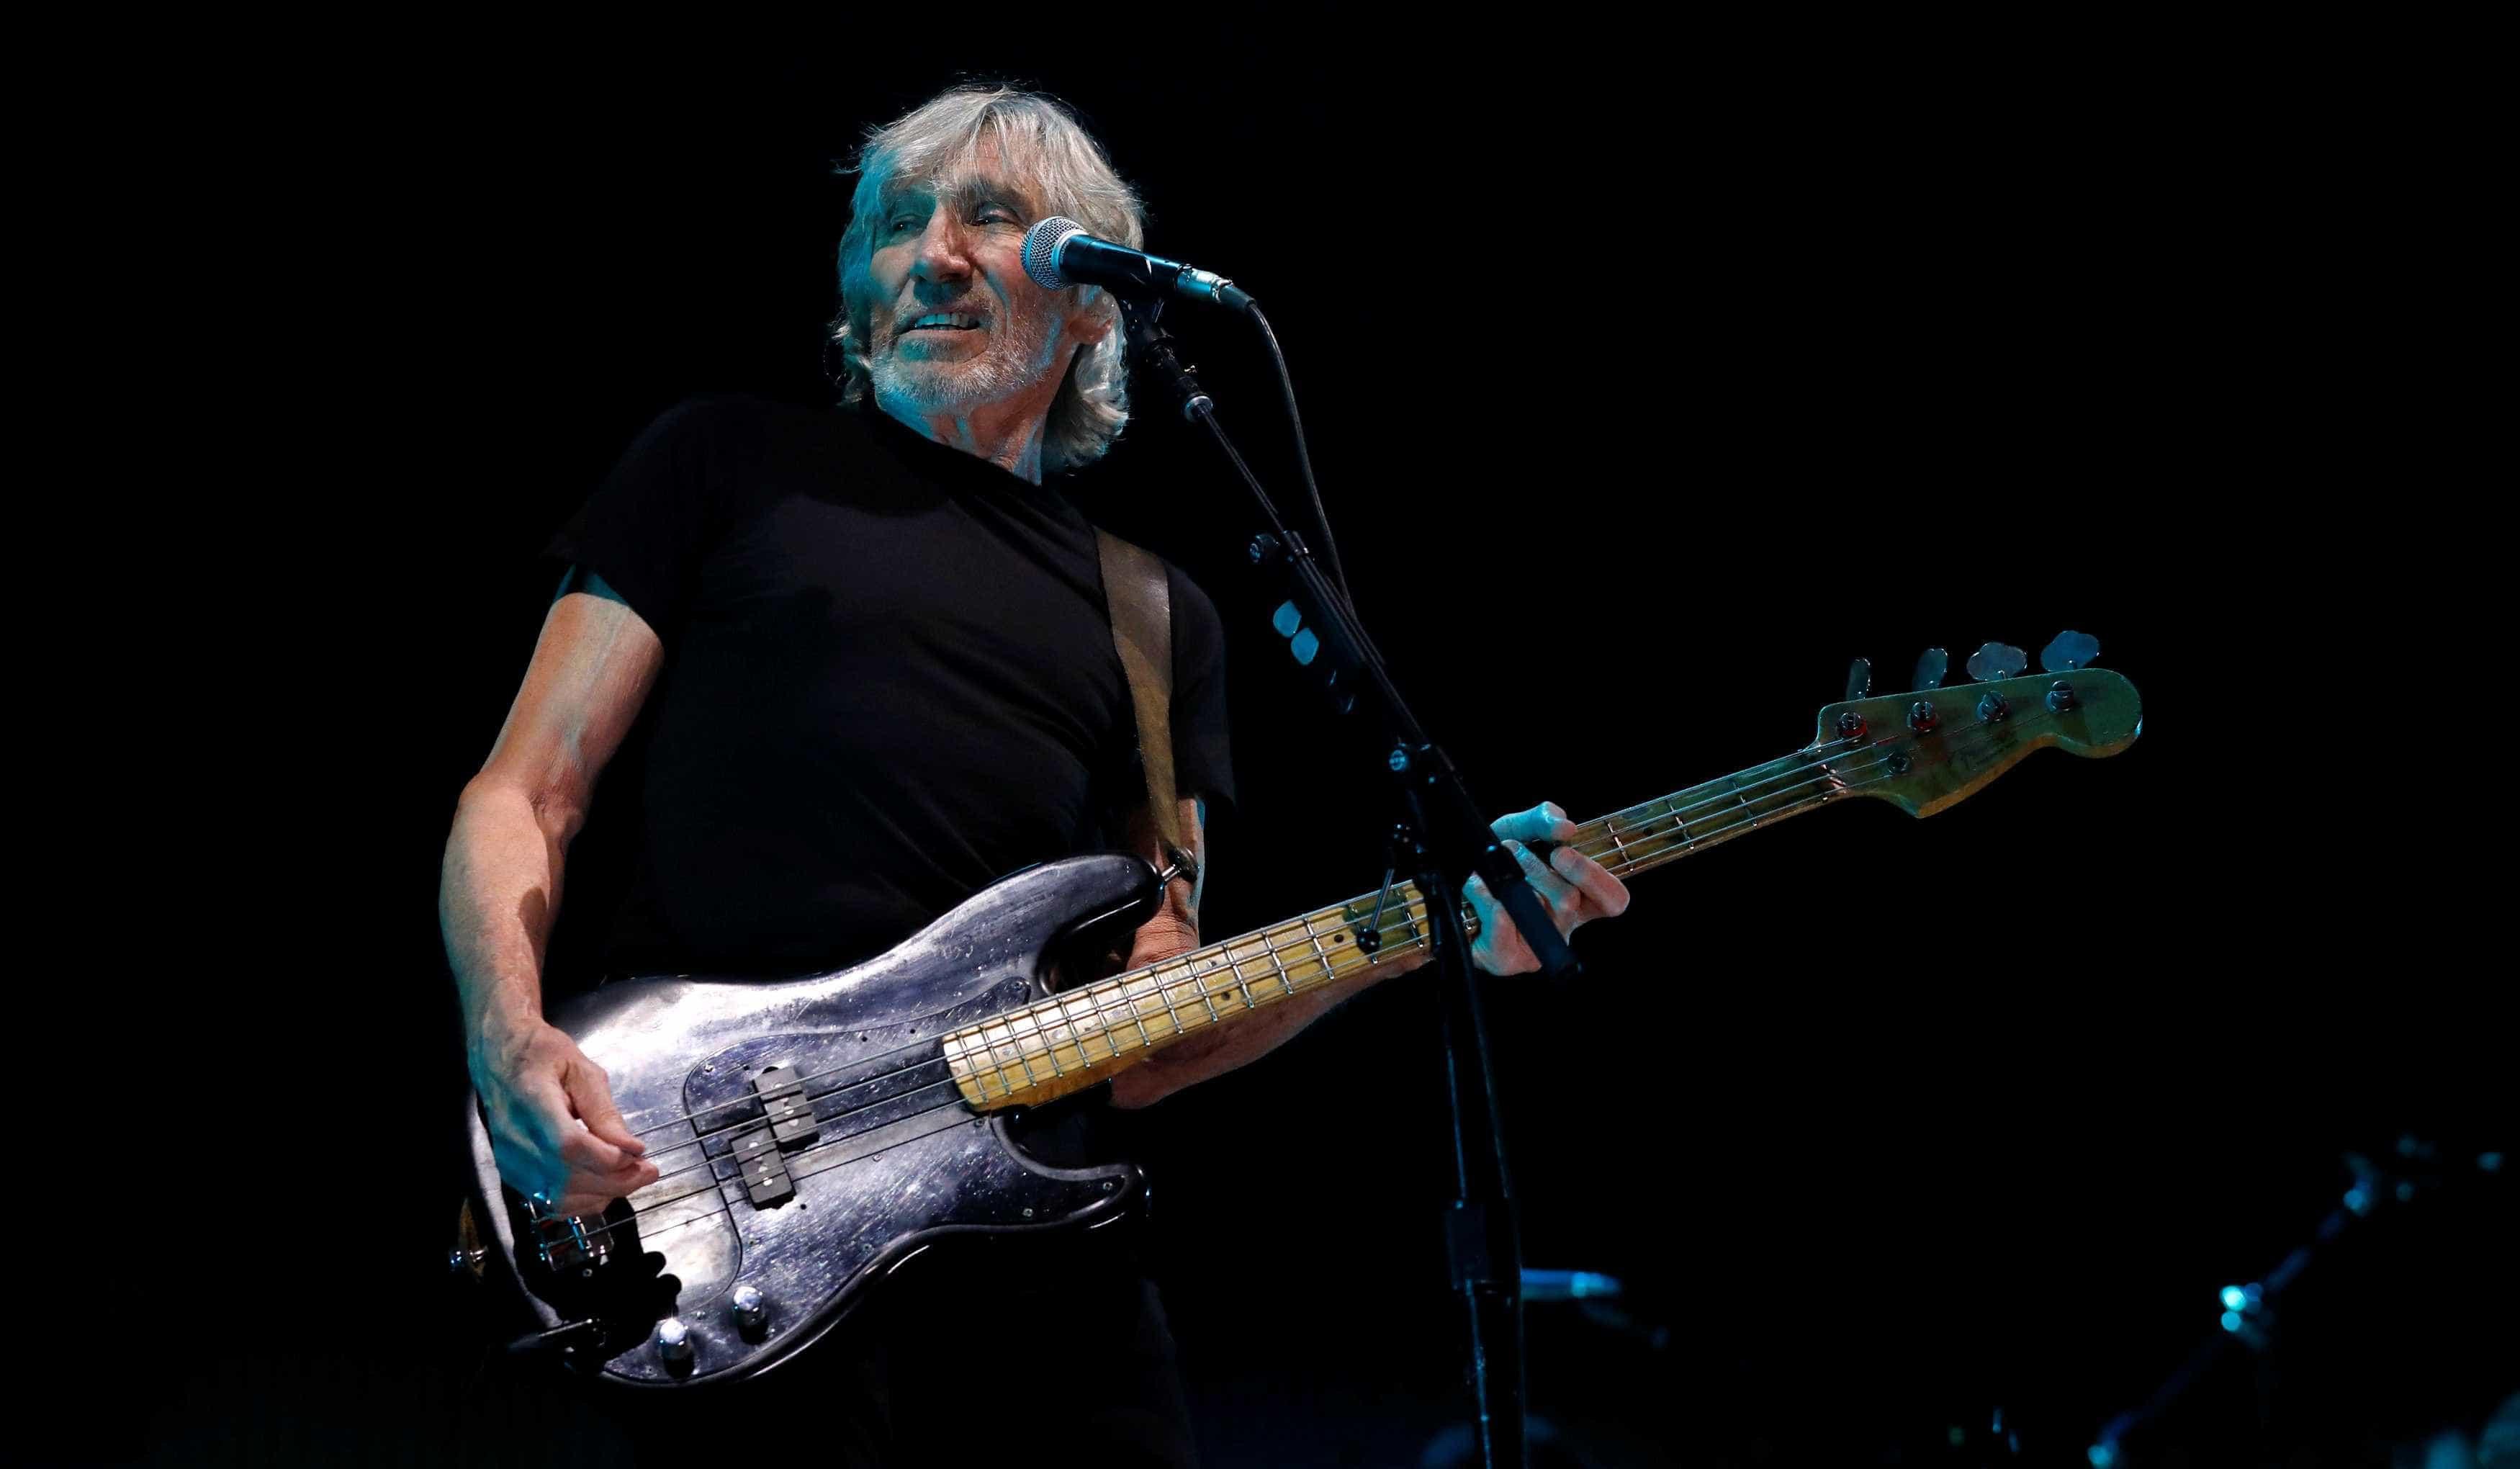 No Brasil ouviu apupos. Já no Uruguai Roger Waters foi homenageado